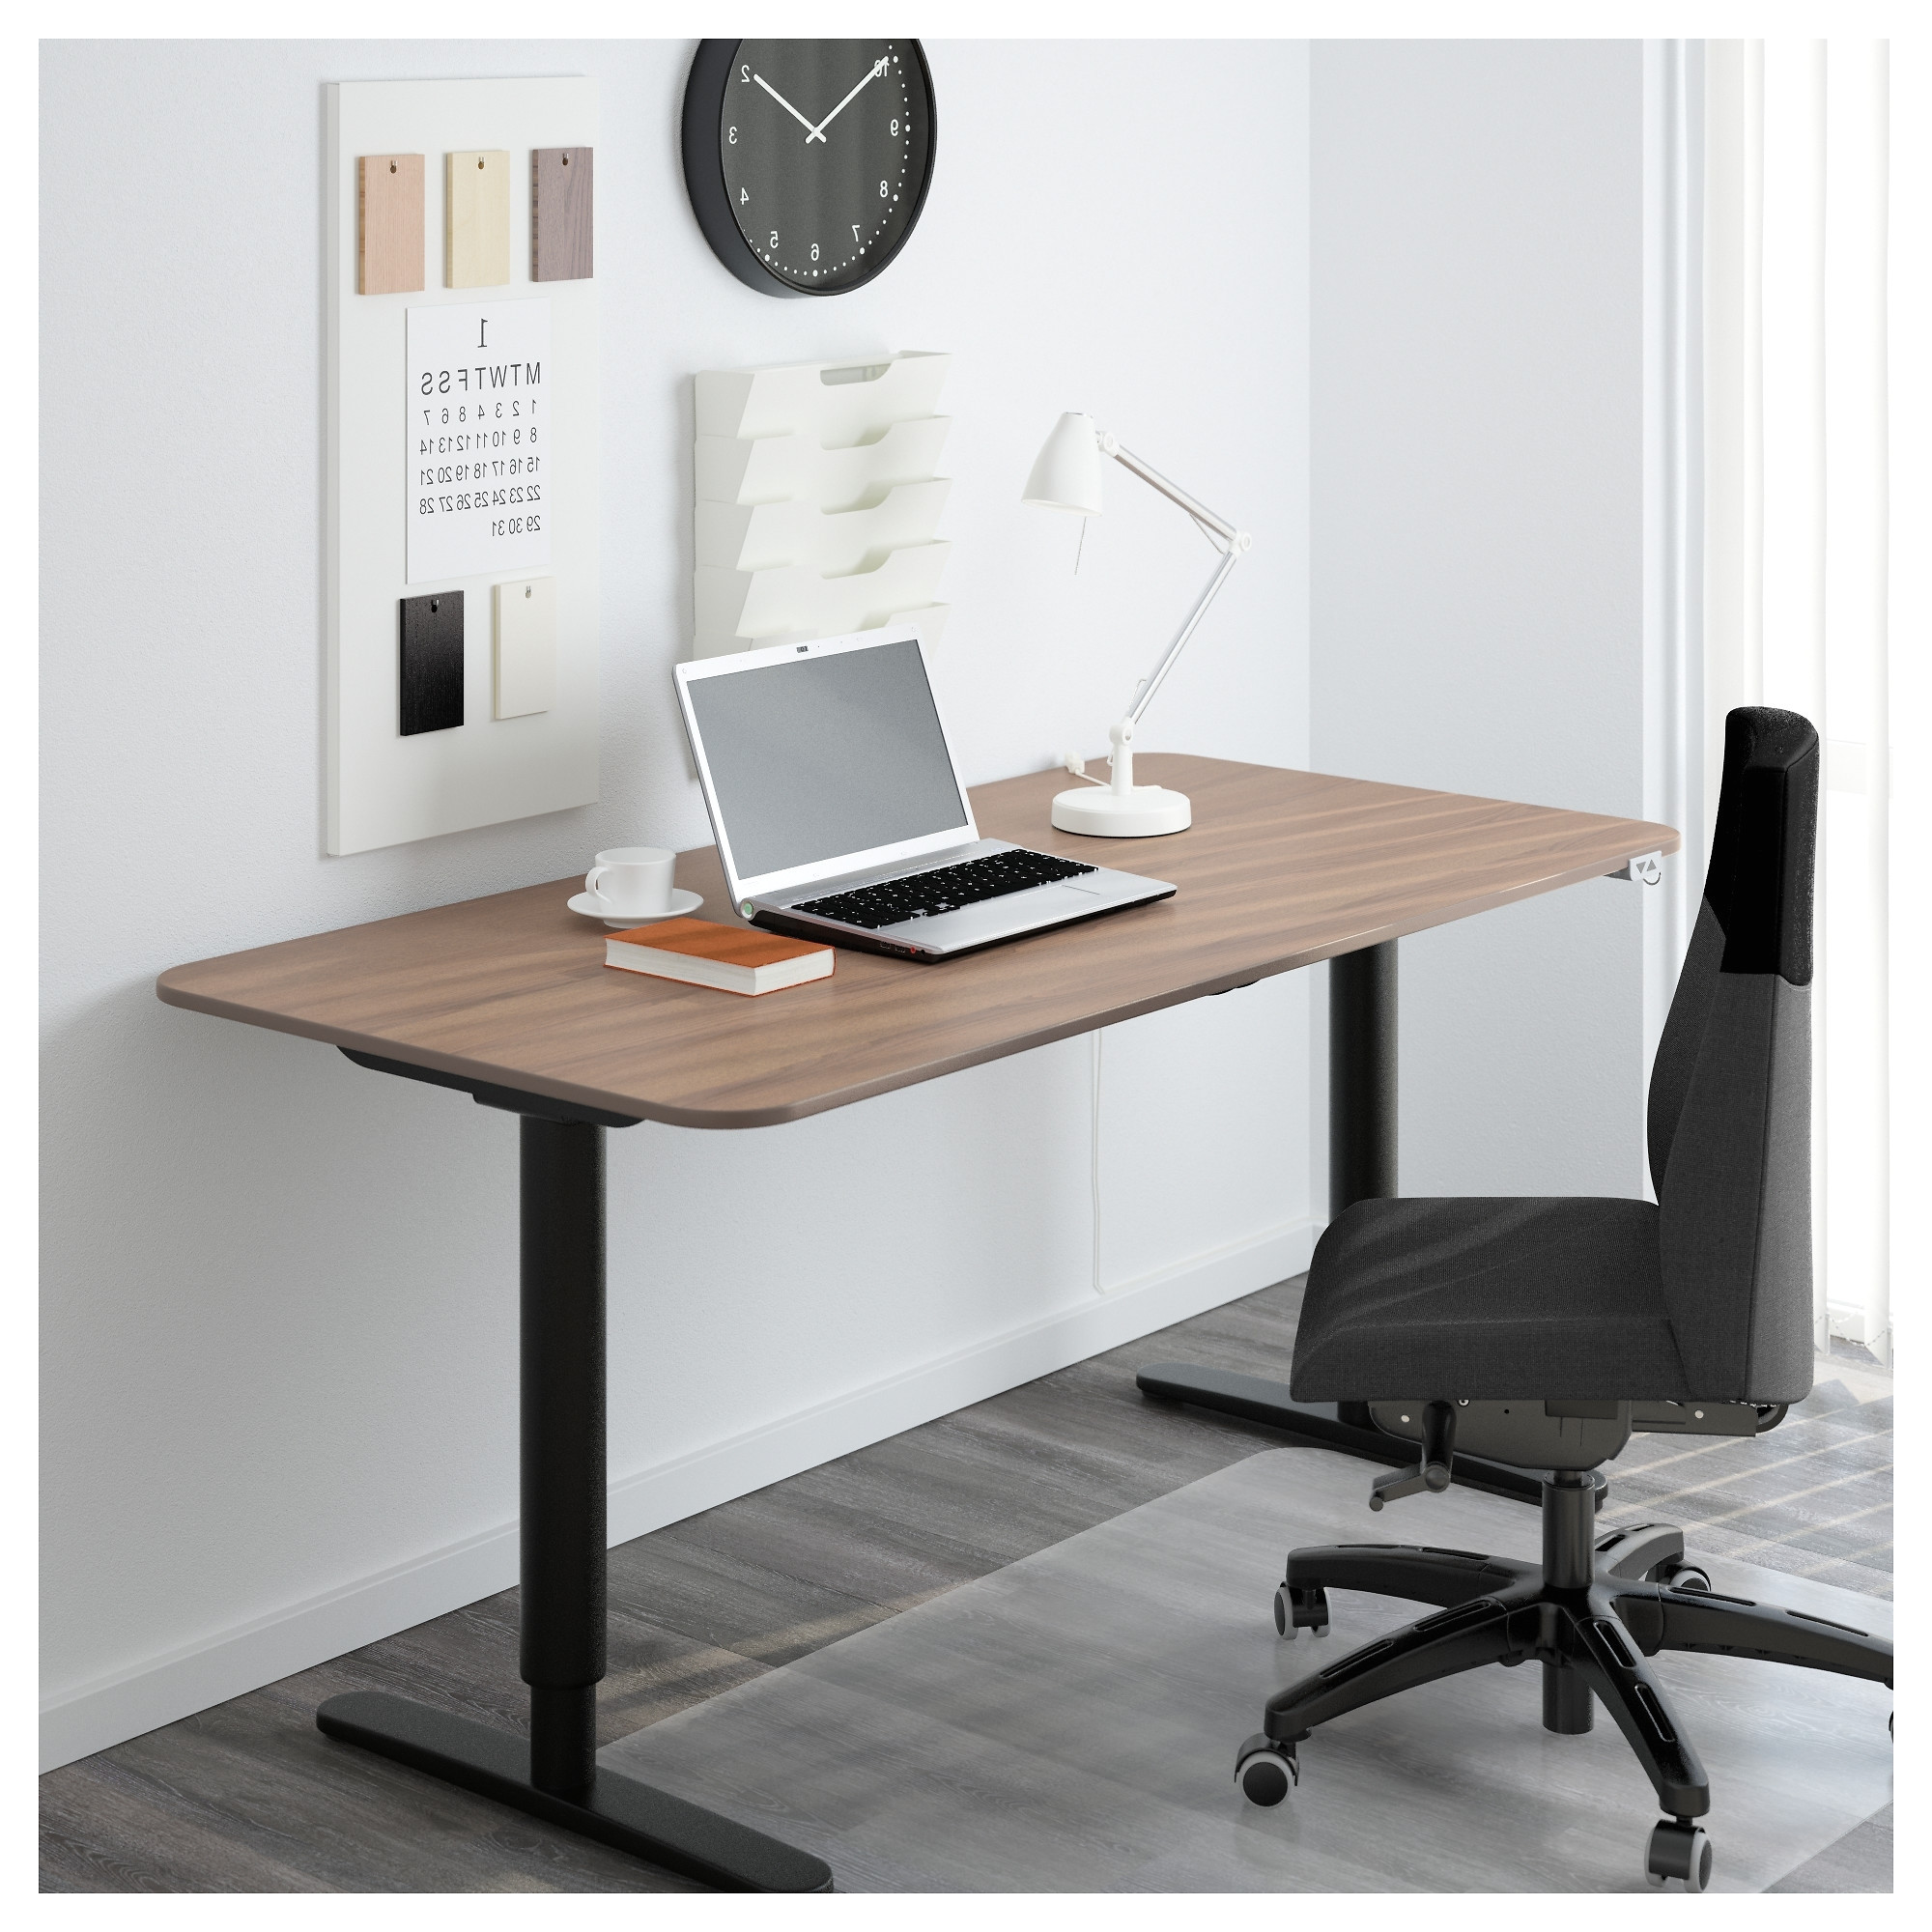 Ikea Galant Left Corner Desk Assembly Instructions Adinaporter